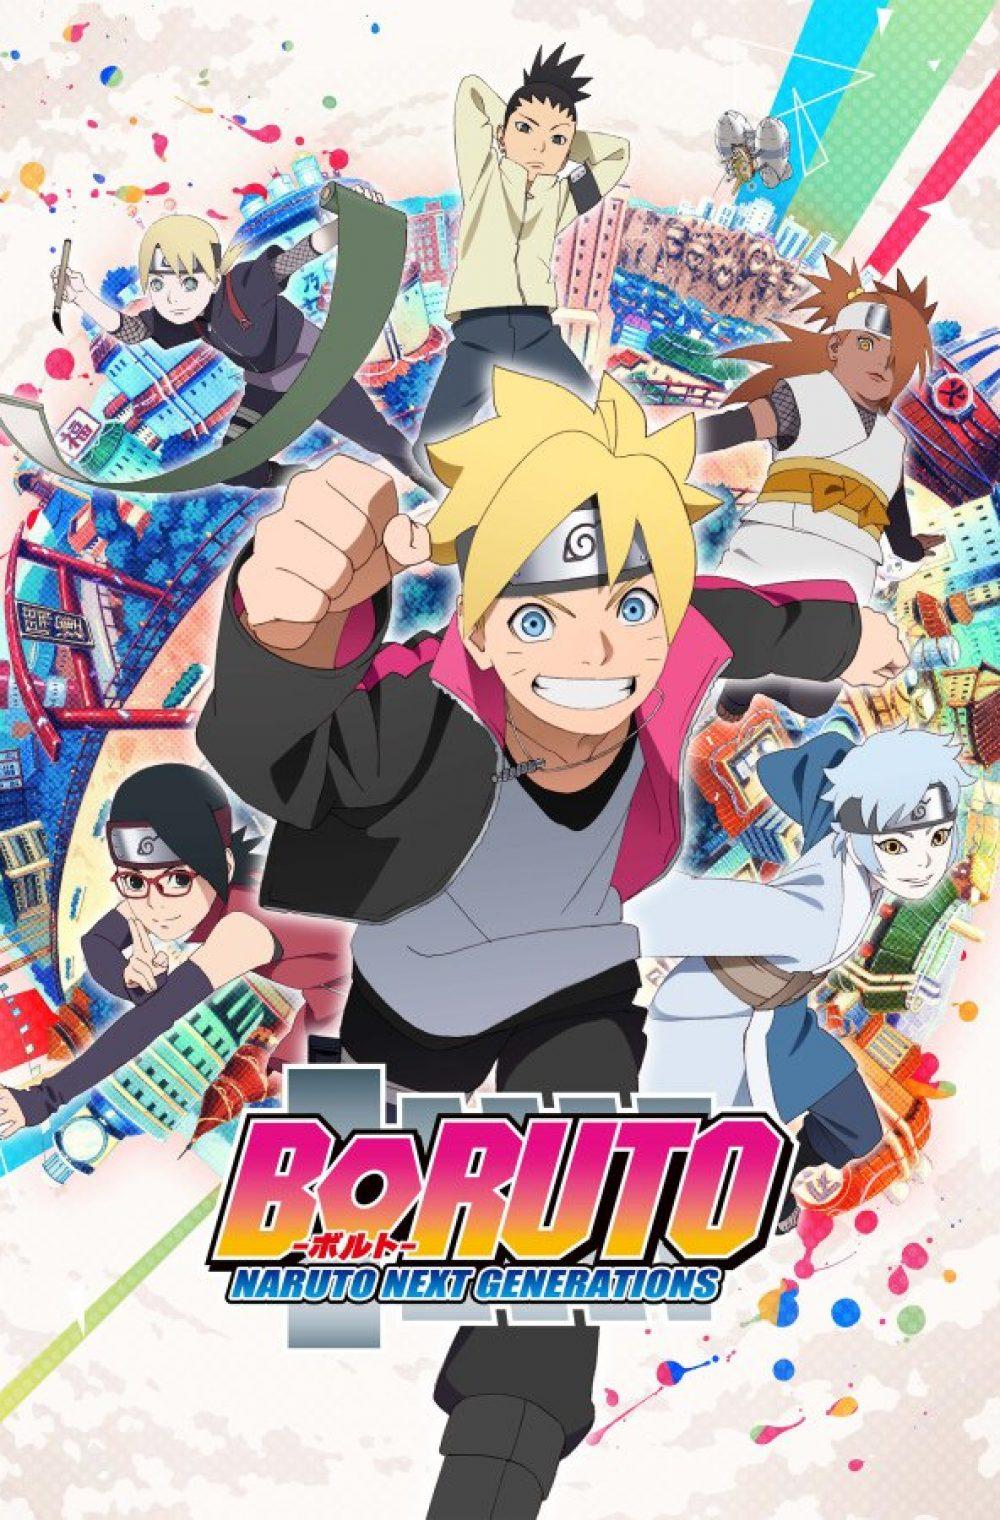 Boruto: Naruto Next Generations (Part 2)